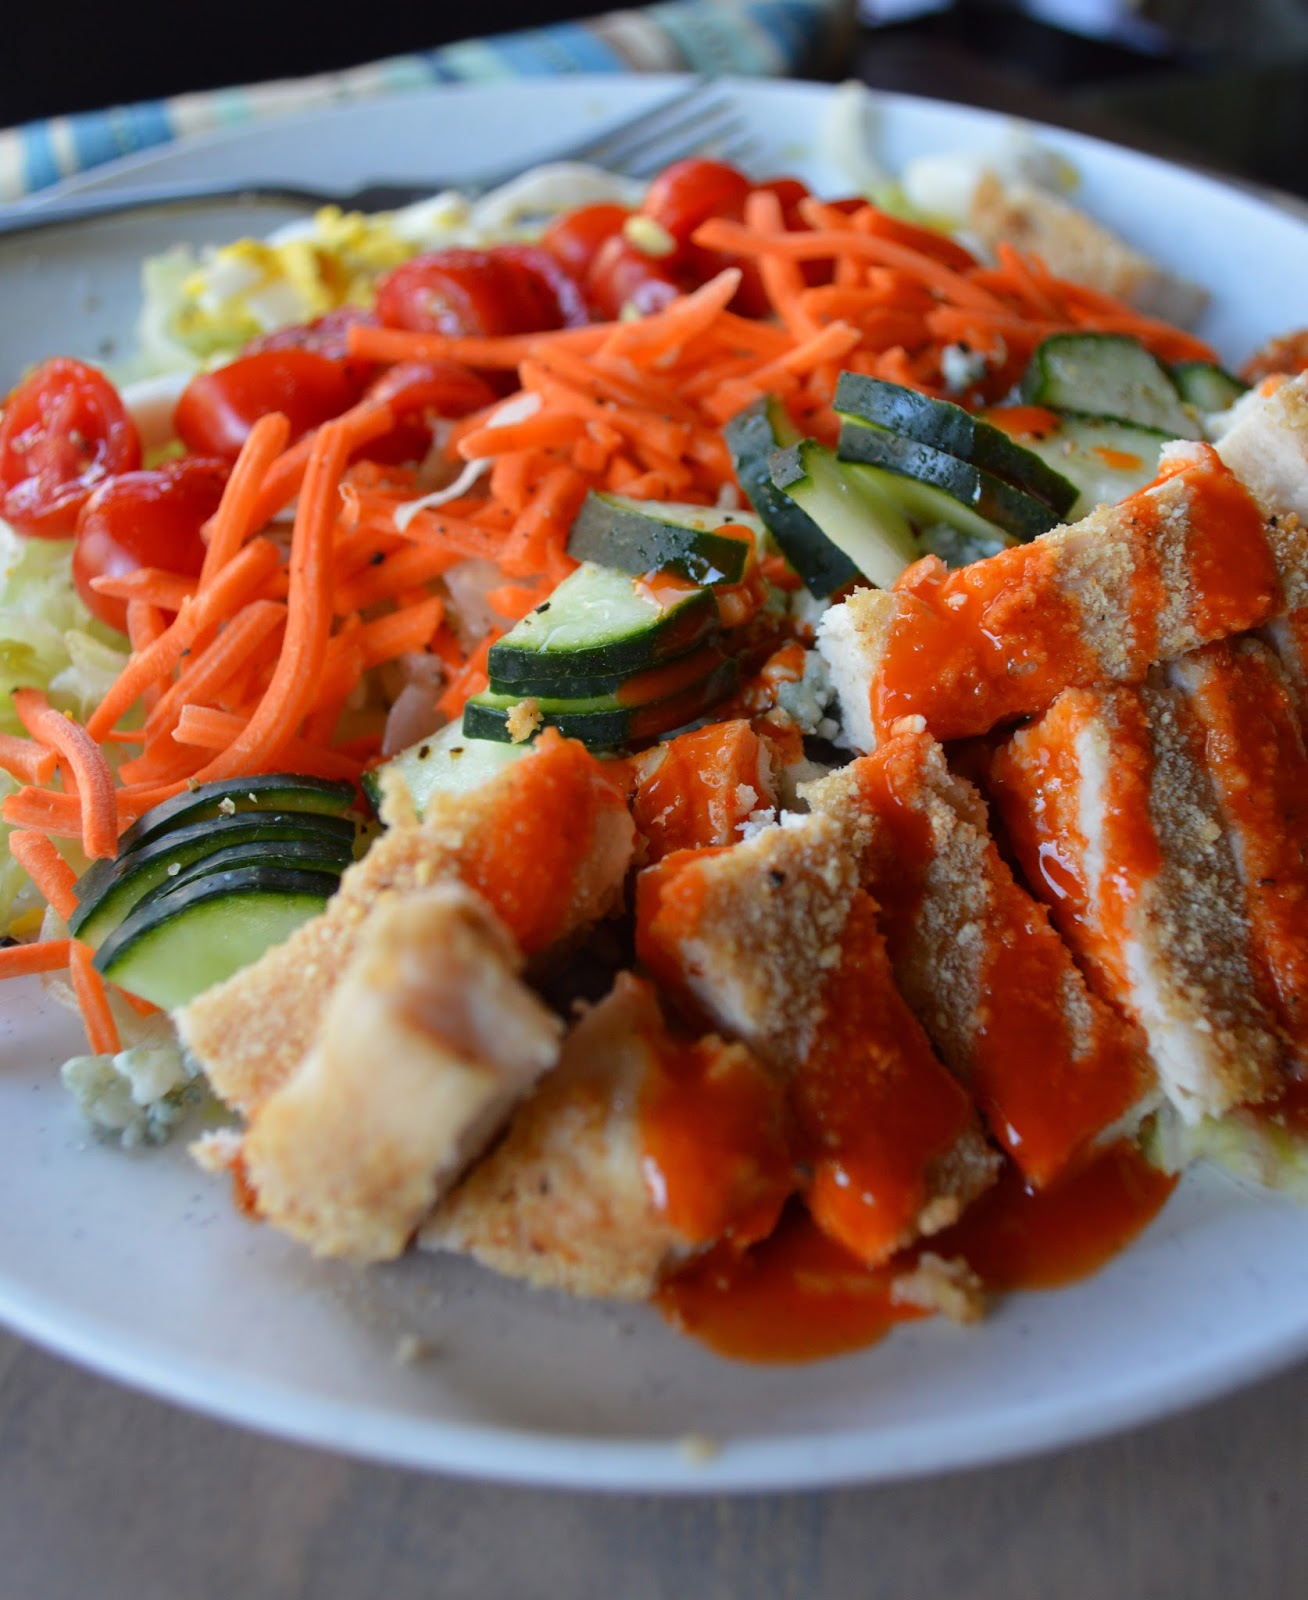 Paleo Girl's Kitchen: Buffalo Chicken Salad!